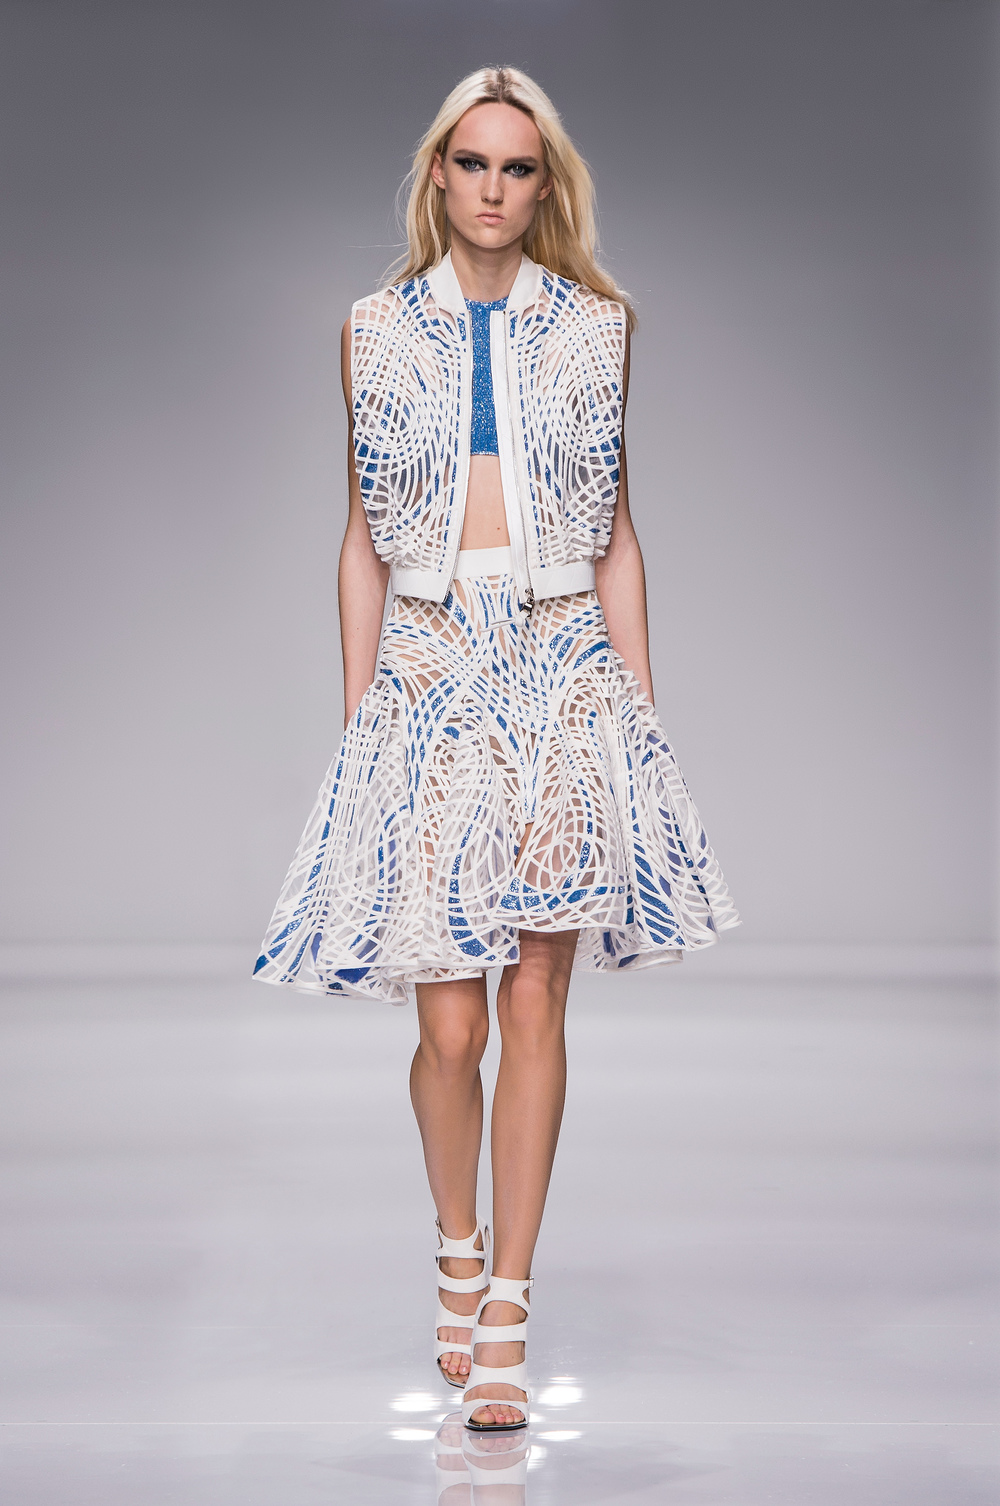 Atelier Versace SS16_Look 21.JPG